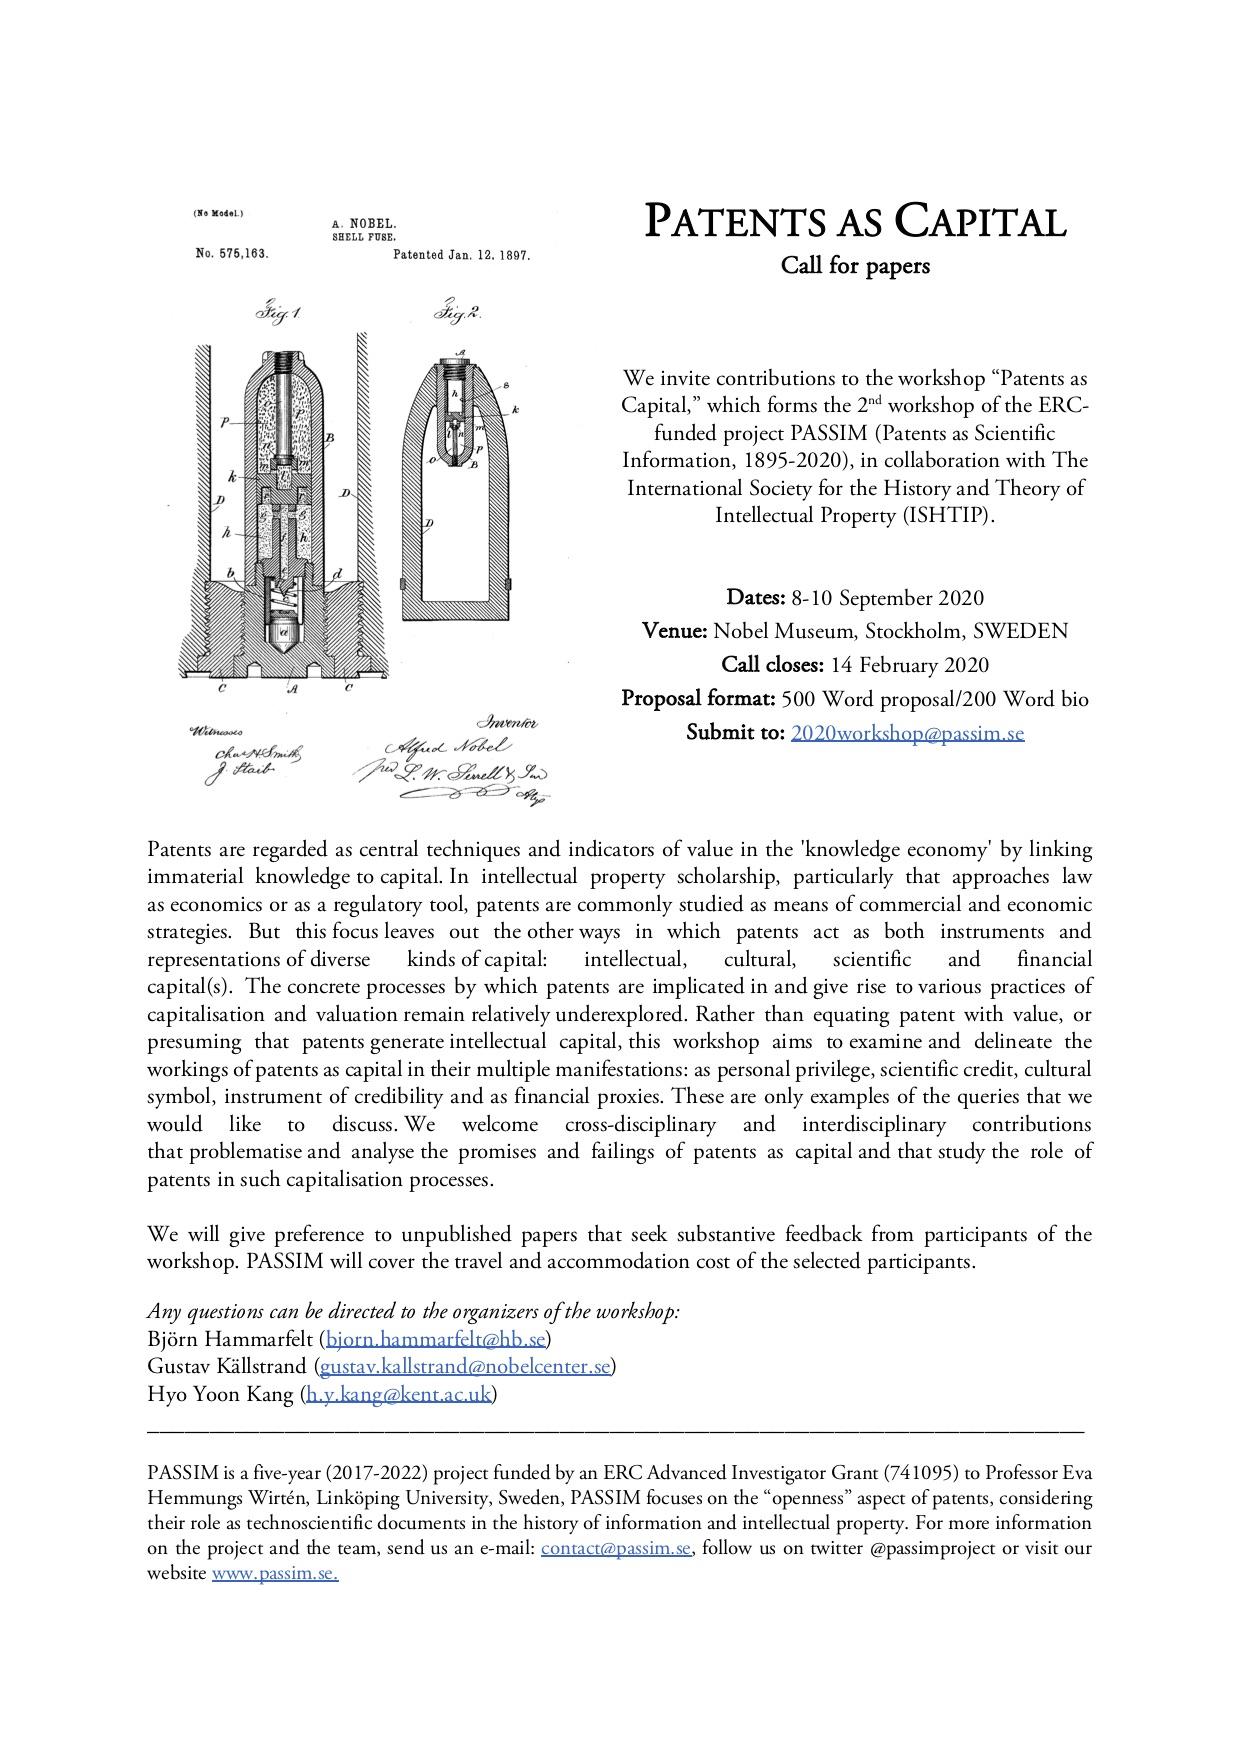 CfP PASSIM patents as capital workshop